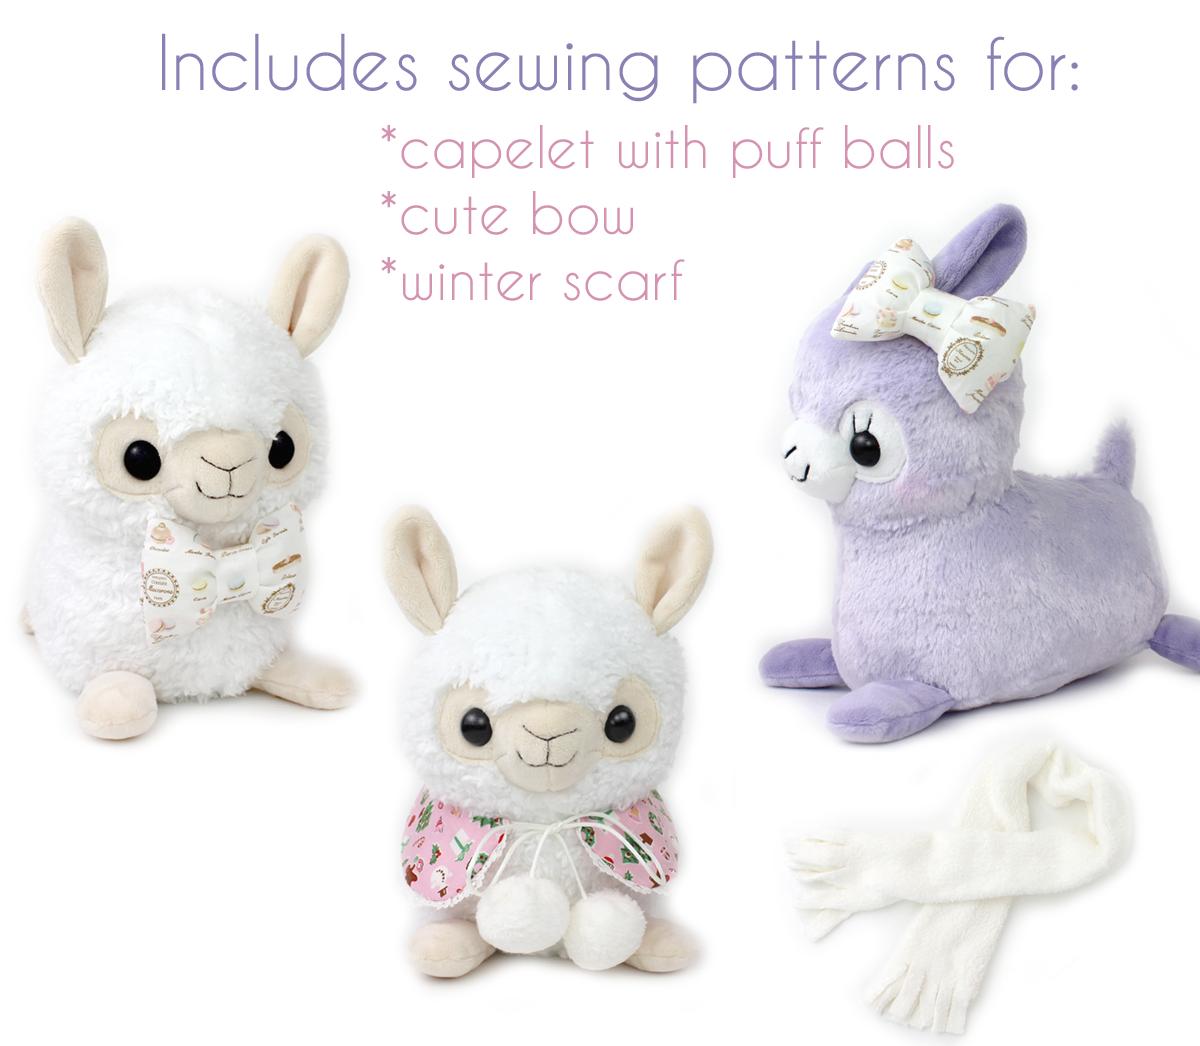 alpaca-sewing-pattern-by-teacuplion-accessories2   Jenna - crafts ...